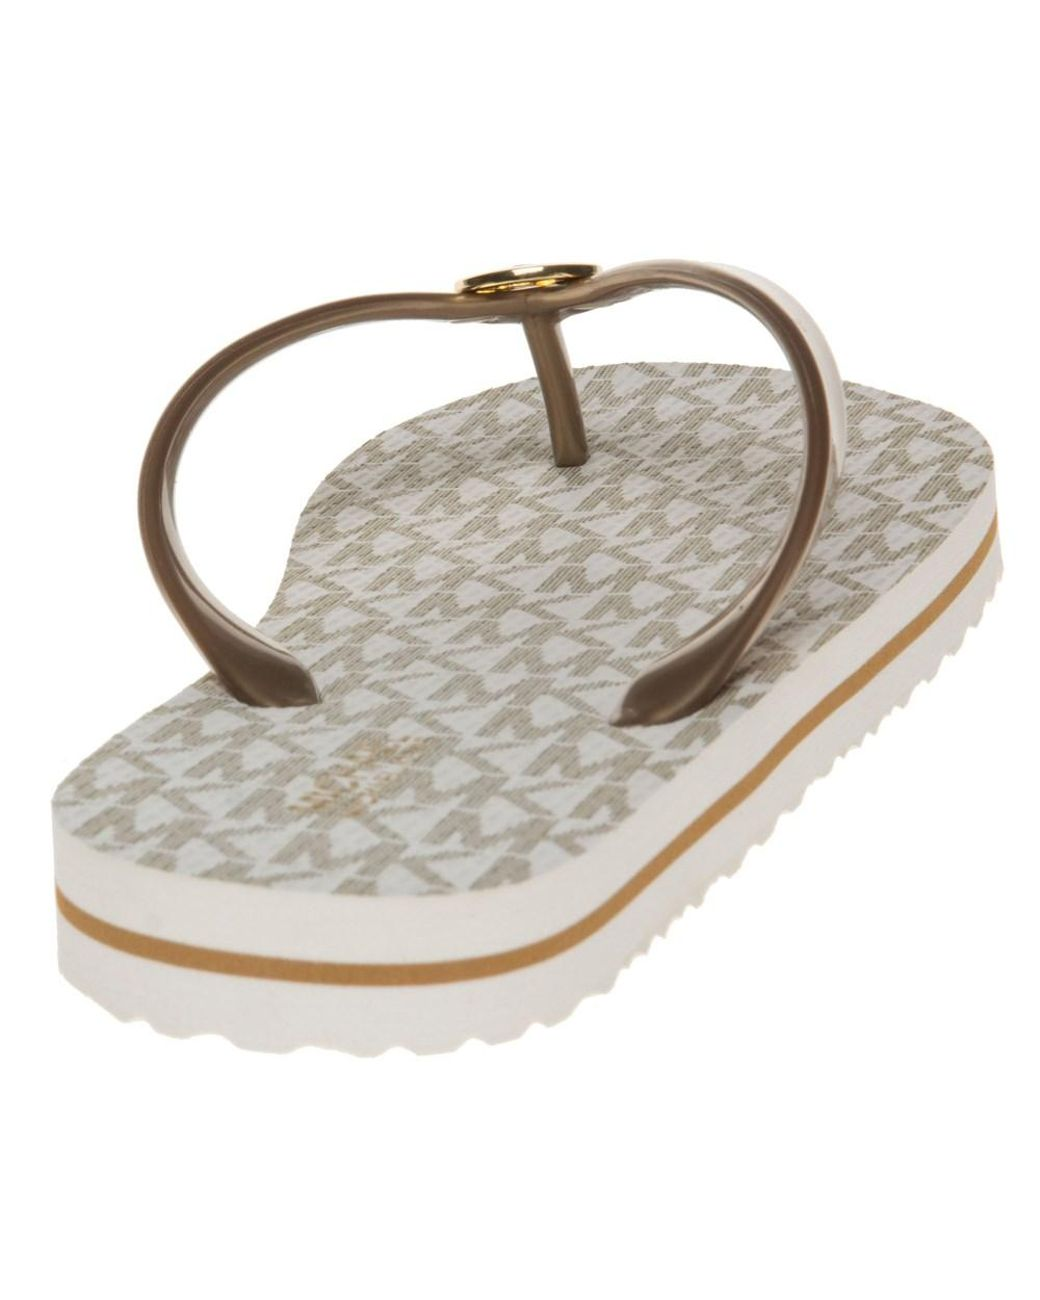 2ccd974e1c5 Michael Kors Mk Flip Flop Stripe Eva Sandals - Lyst